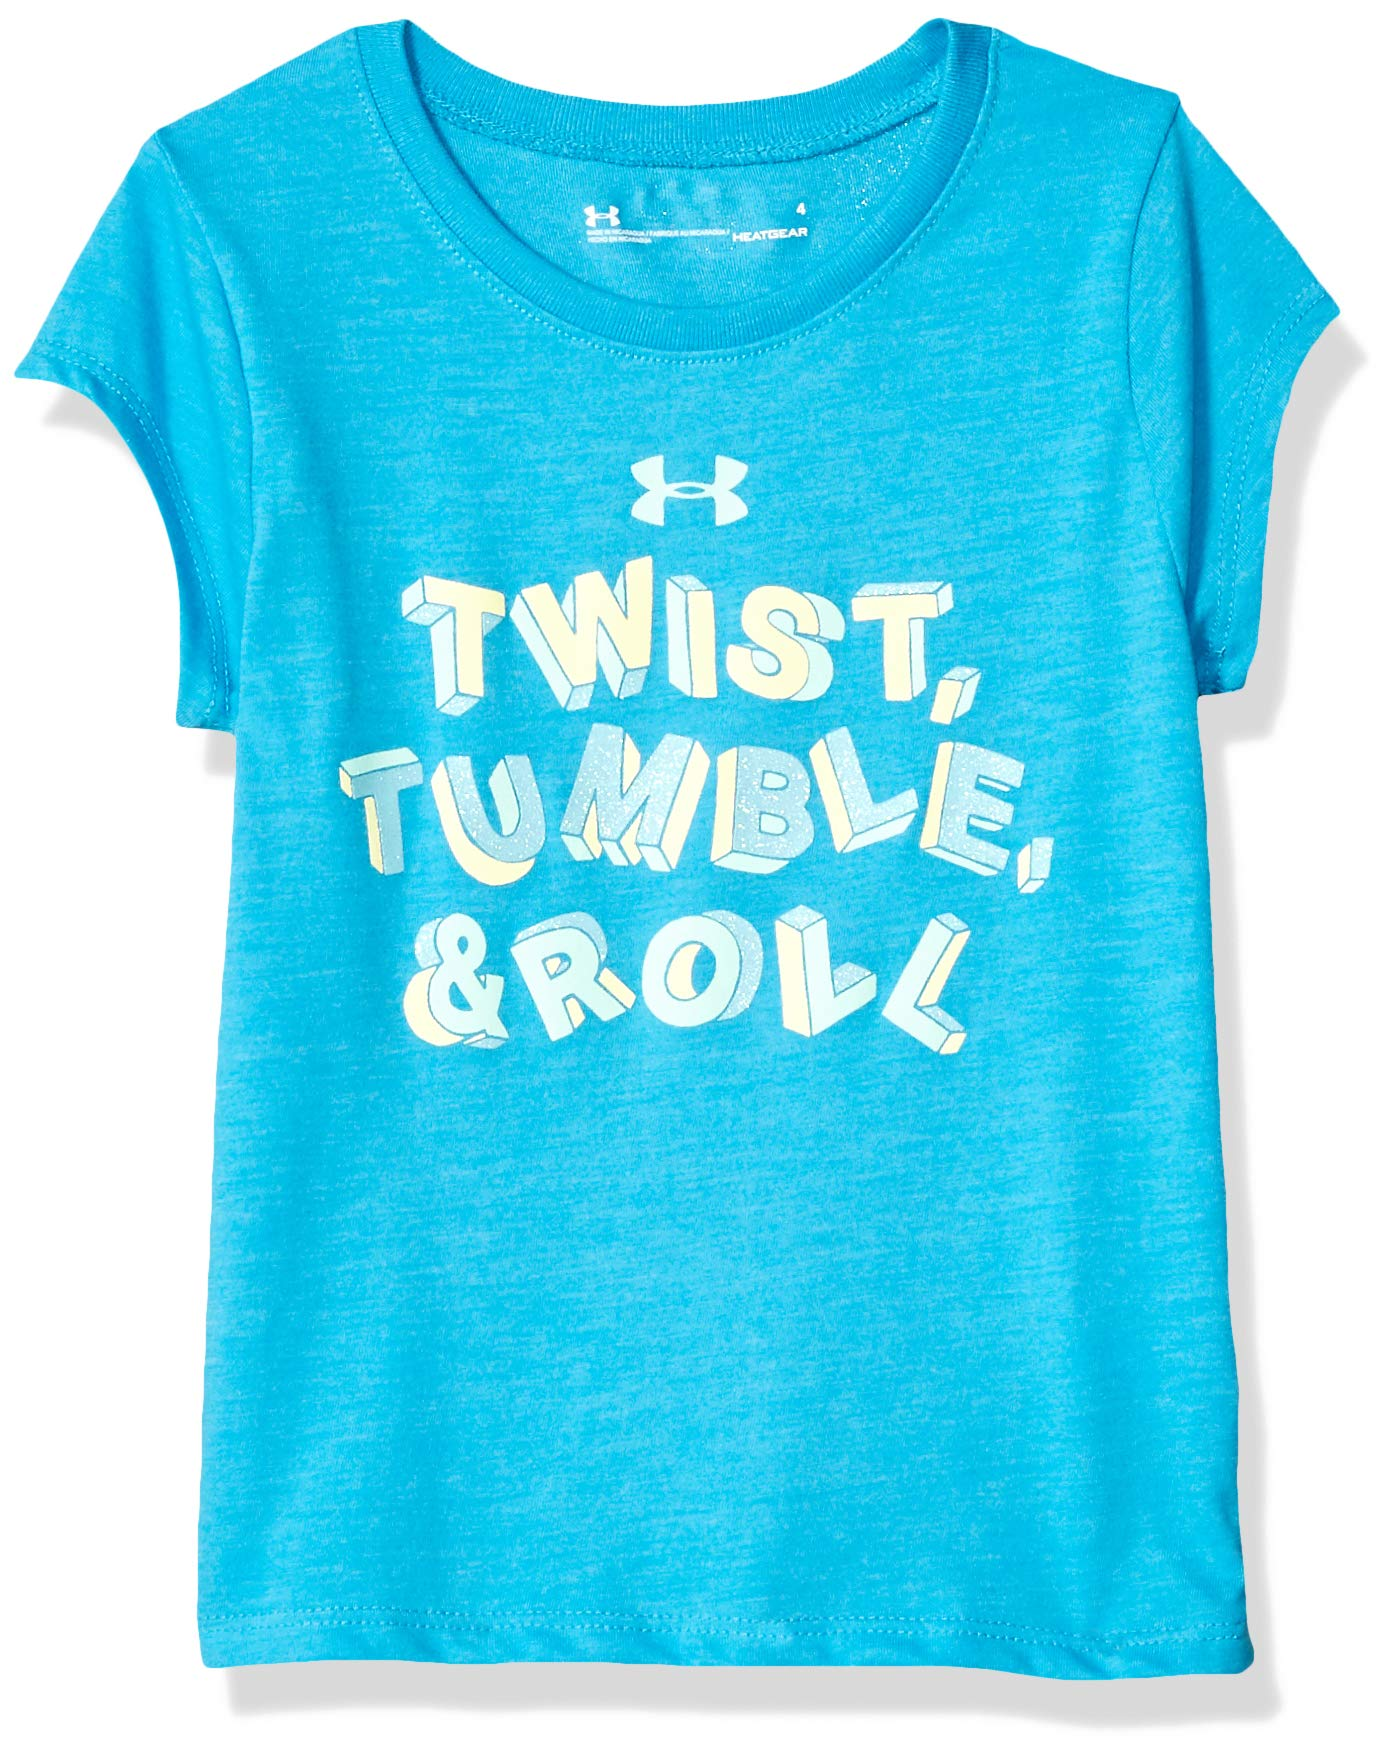 Under Armour Girls Toddler Attitude Ss Tee Shirt Alpine S19 2t